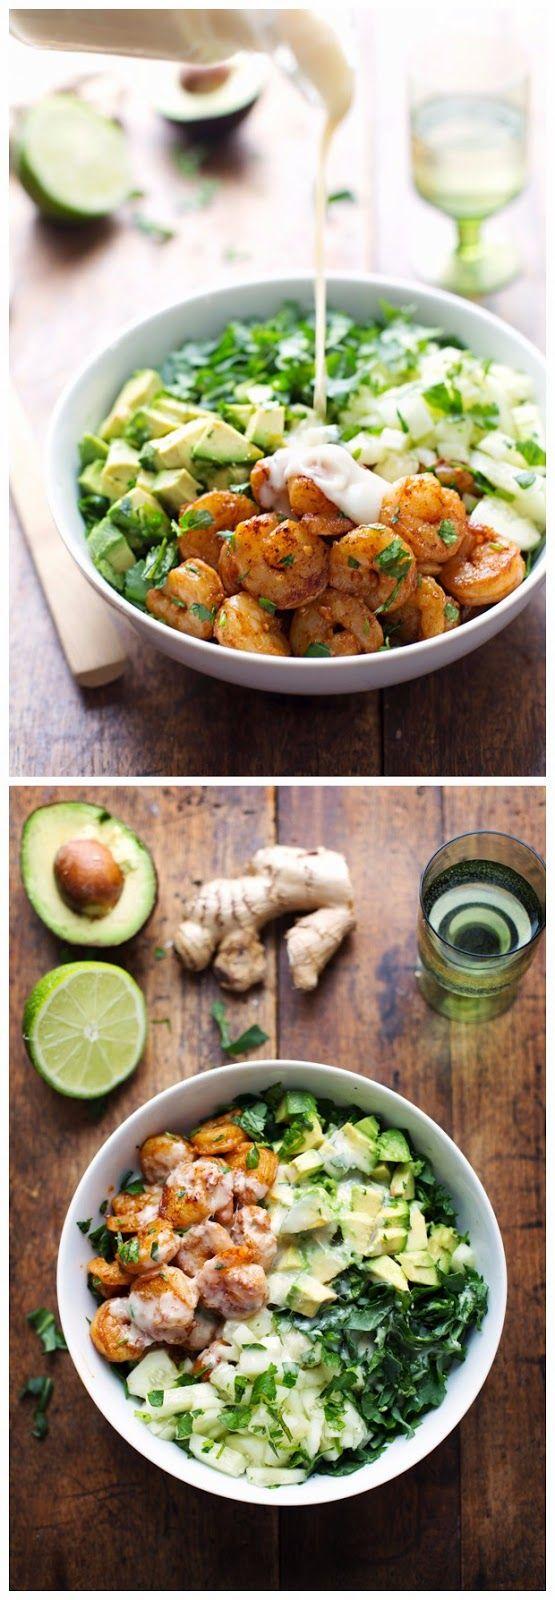 Spicy Shrimp and Avocado Salad with Creamy Miso Dressing